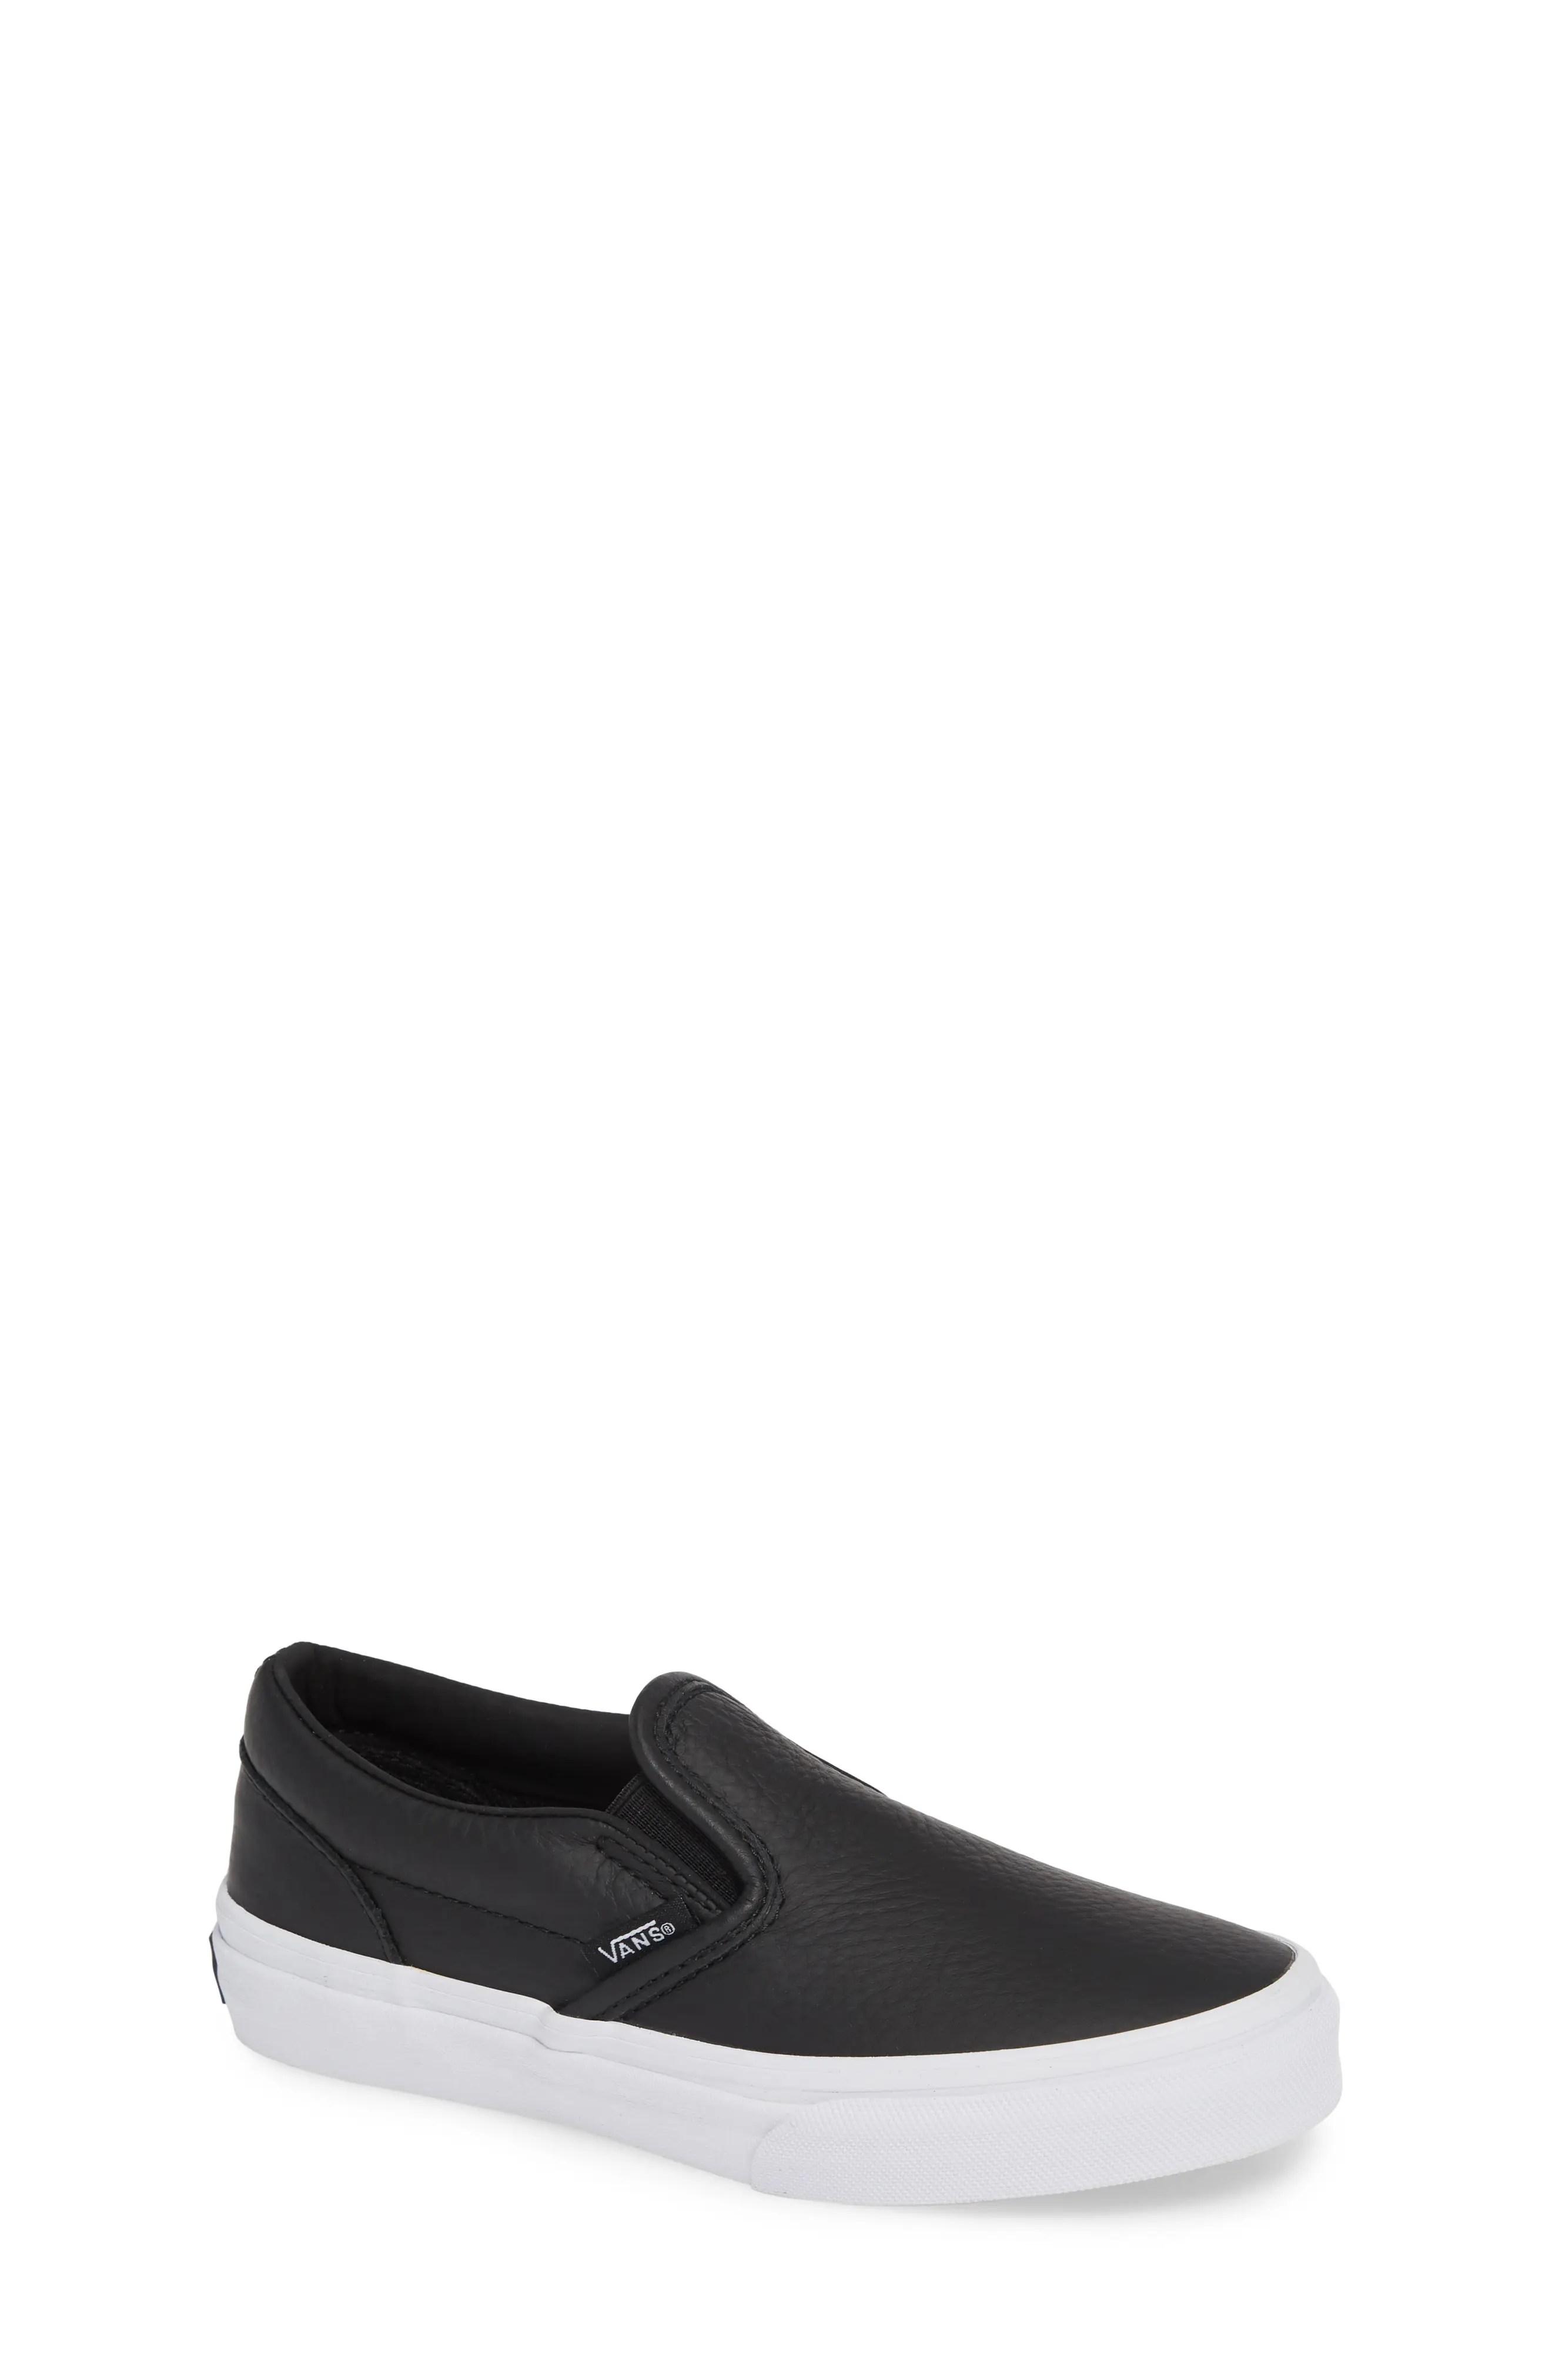 Vans  classic slip on sneaker walker toddler little kid big also shoes sizes nordstrom rh shoprdstrom